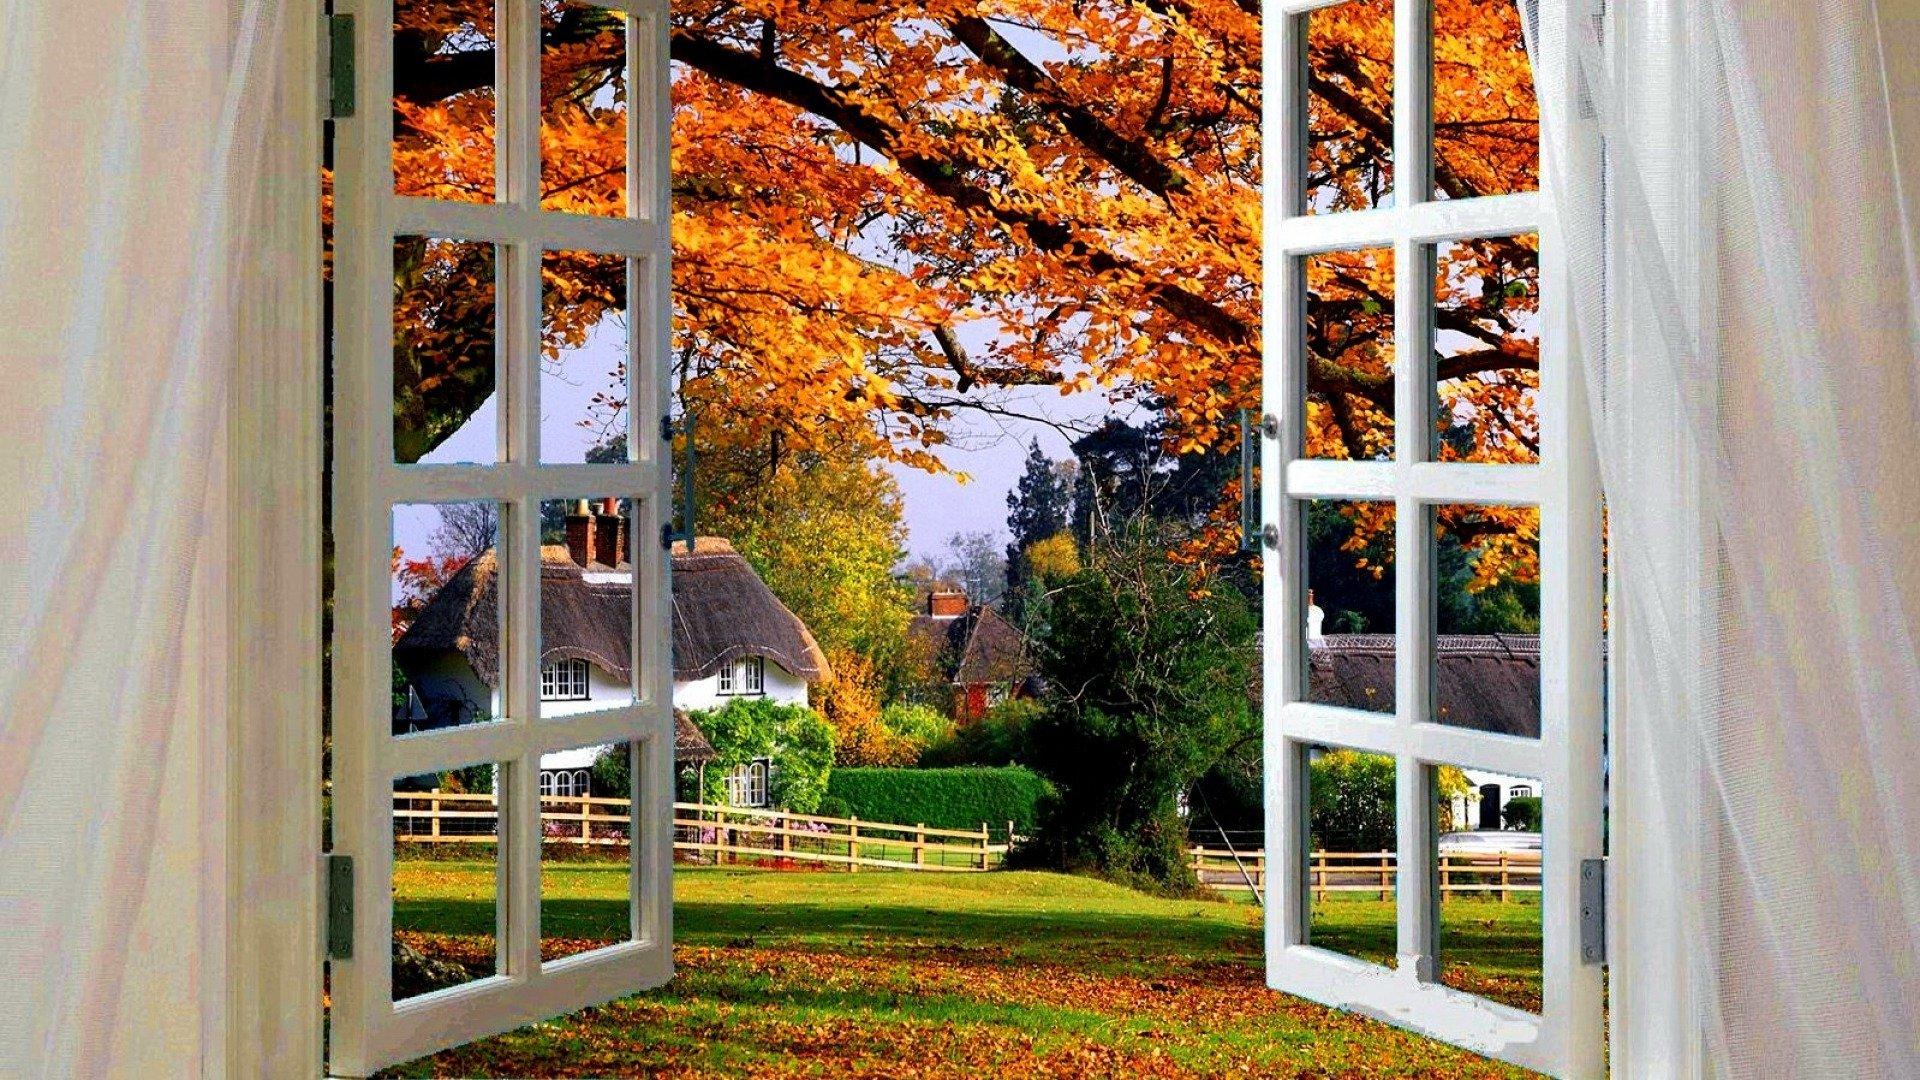 French Fall Wallpaper View On Autumn Day Fond D 233 Cran Hd Arri 232 Re Plan